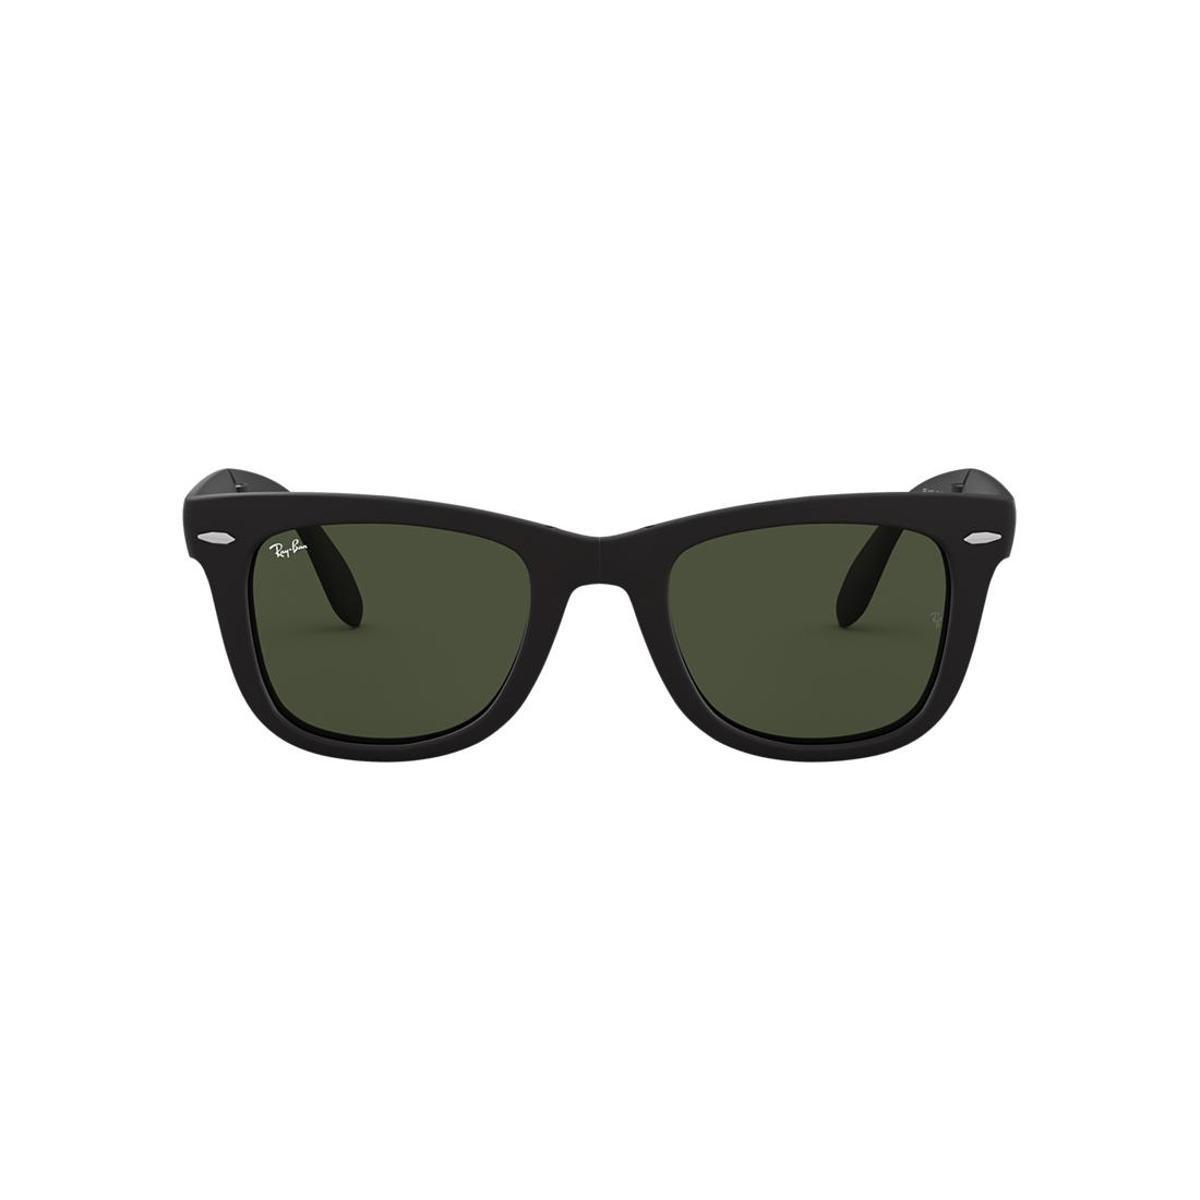 74f559394698d Óculos de Sol Ray-Ban Wayfarer Rb4105 - Preto - Compre Agora